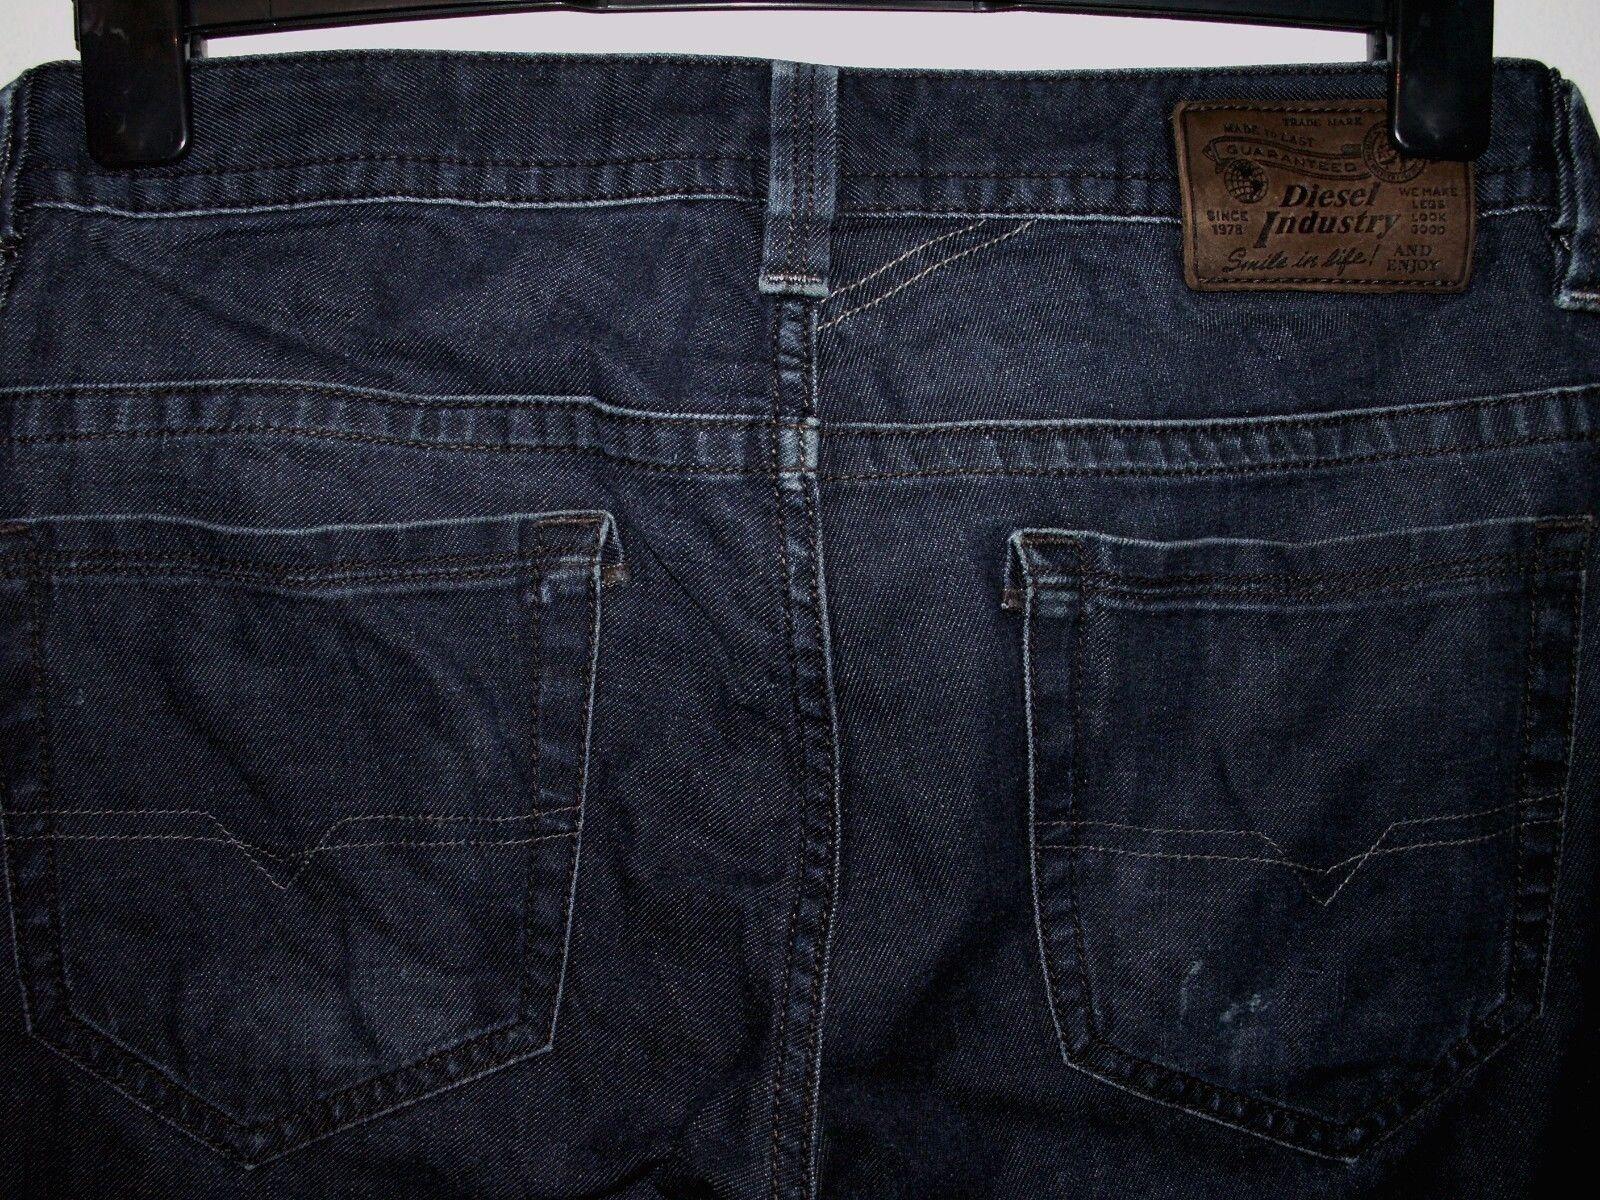 Diesel thavar slim-skinny fit jeans wash 0661D W28 L30 (a2698)